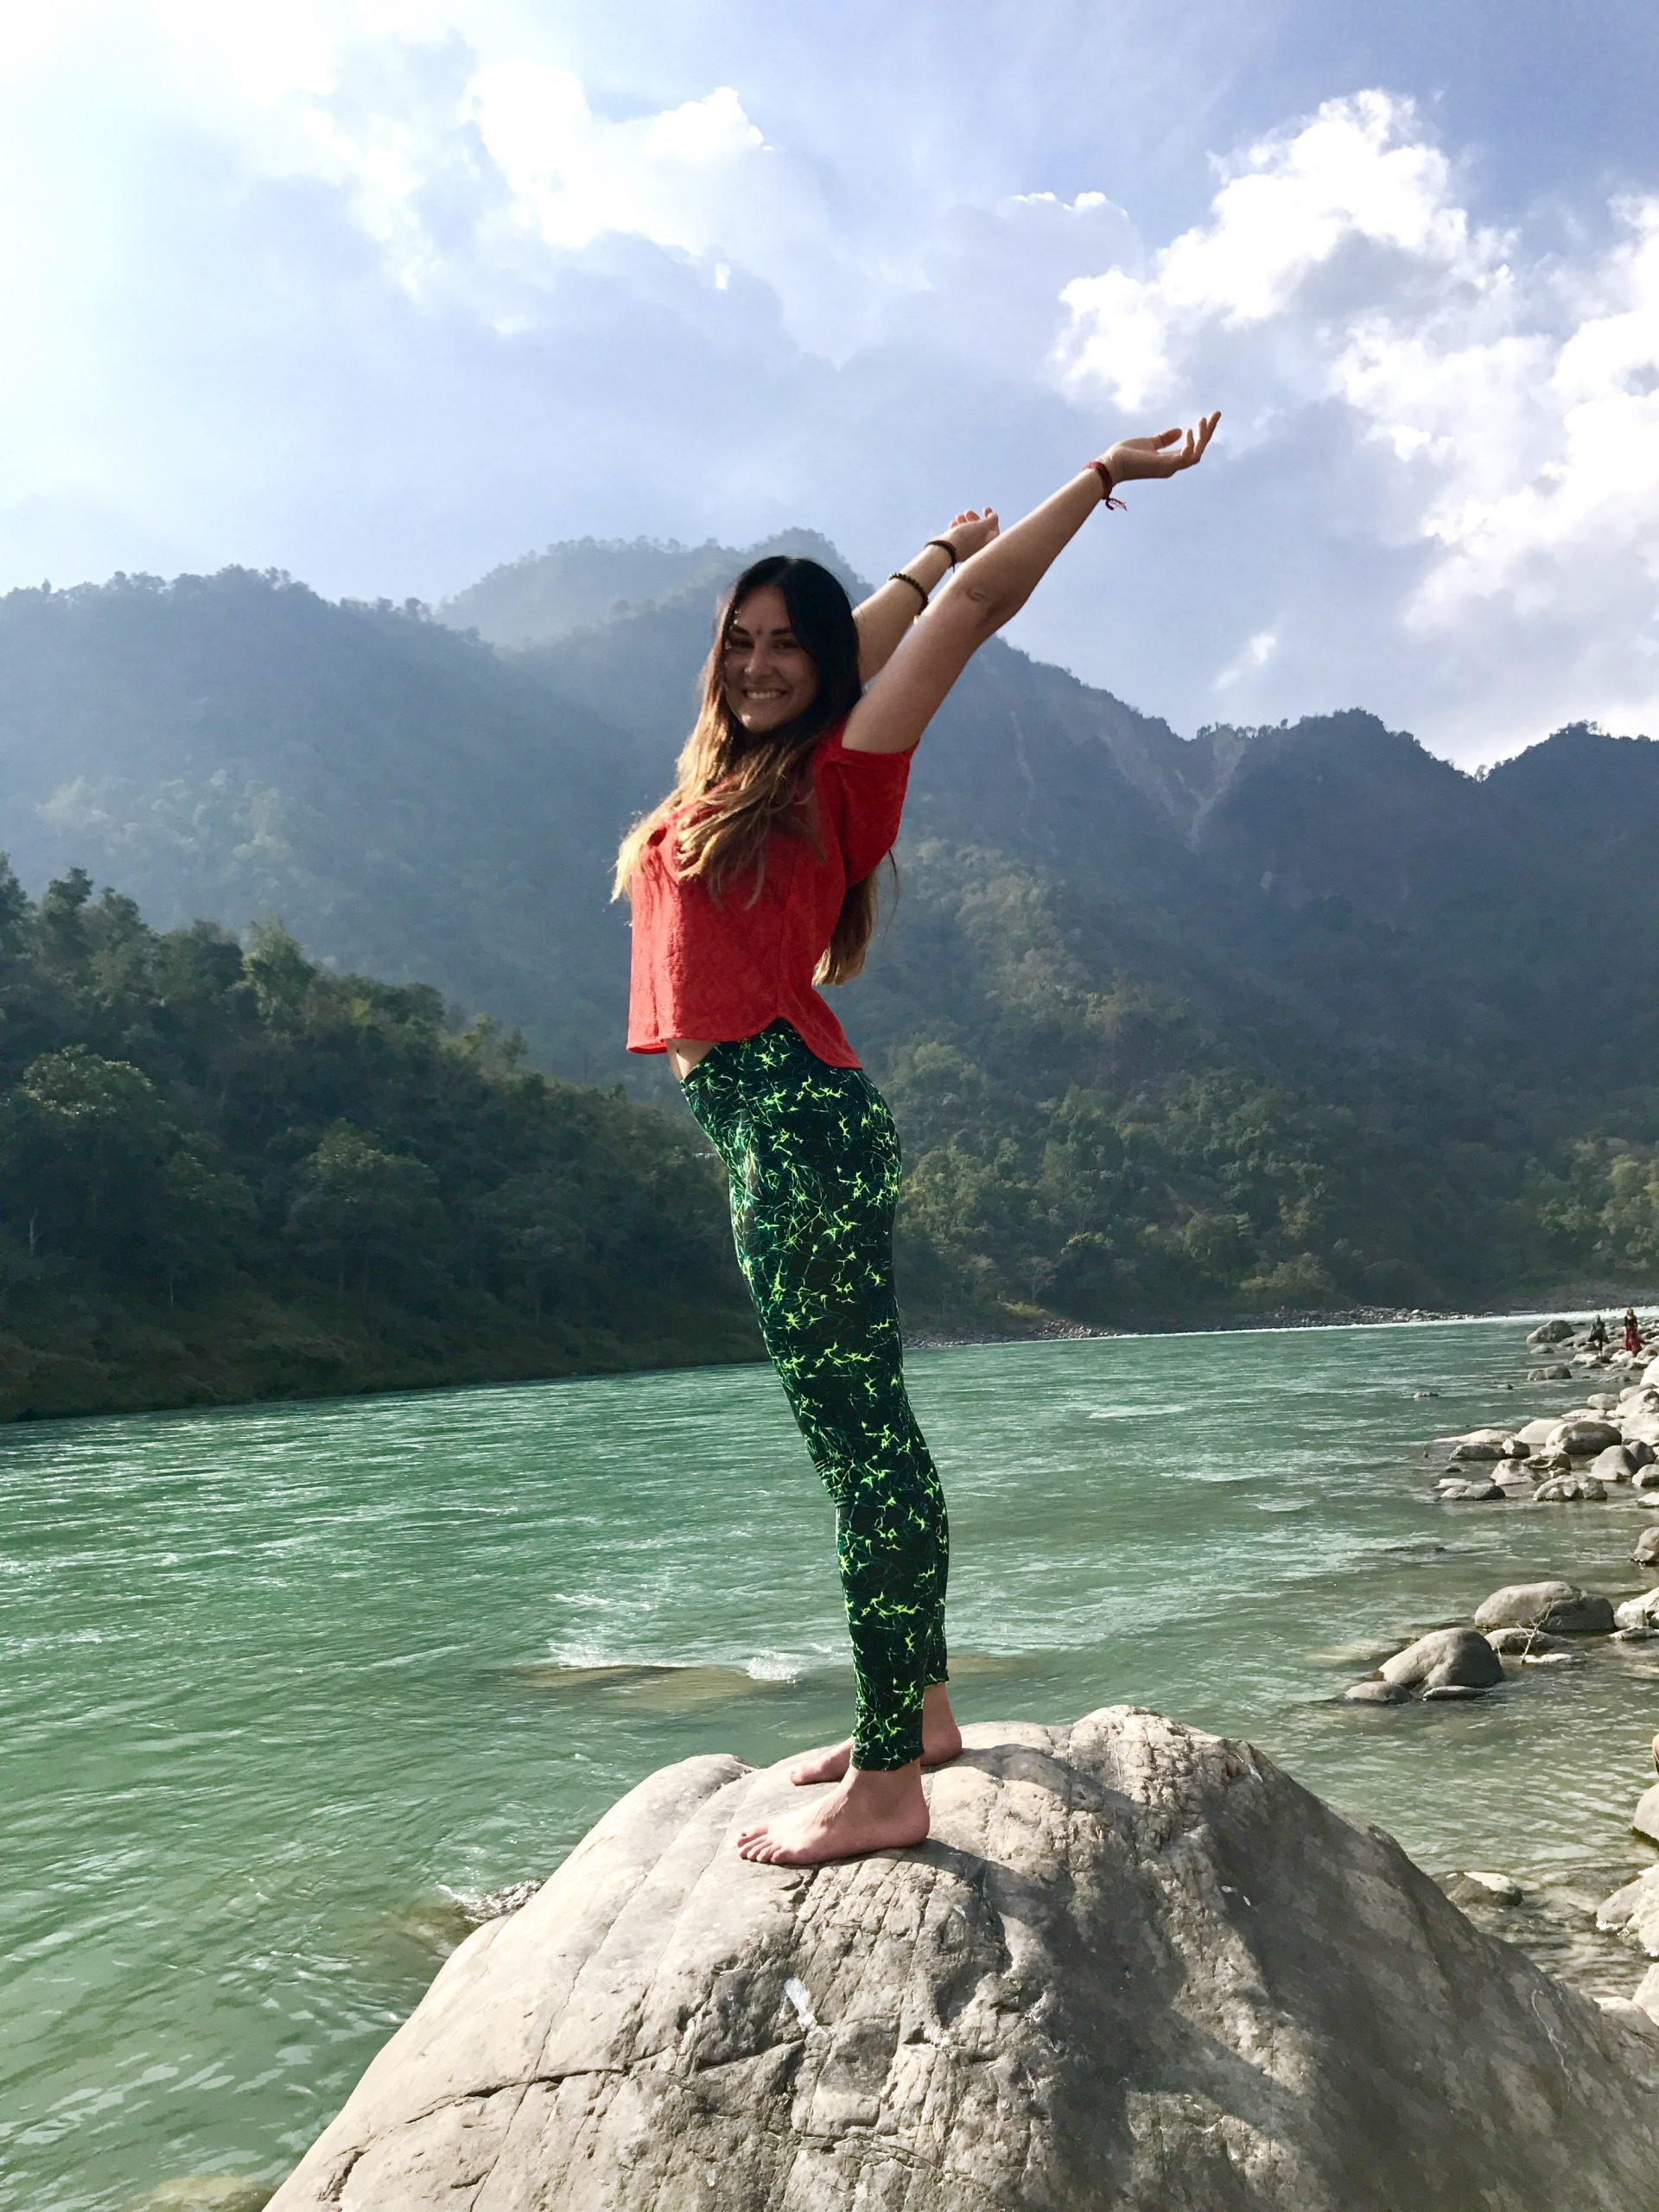 Interviu apie jogą ir jos naudą @ kvanto.lt [article]